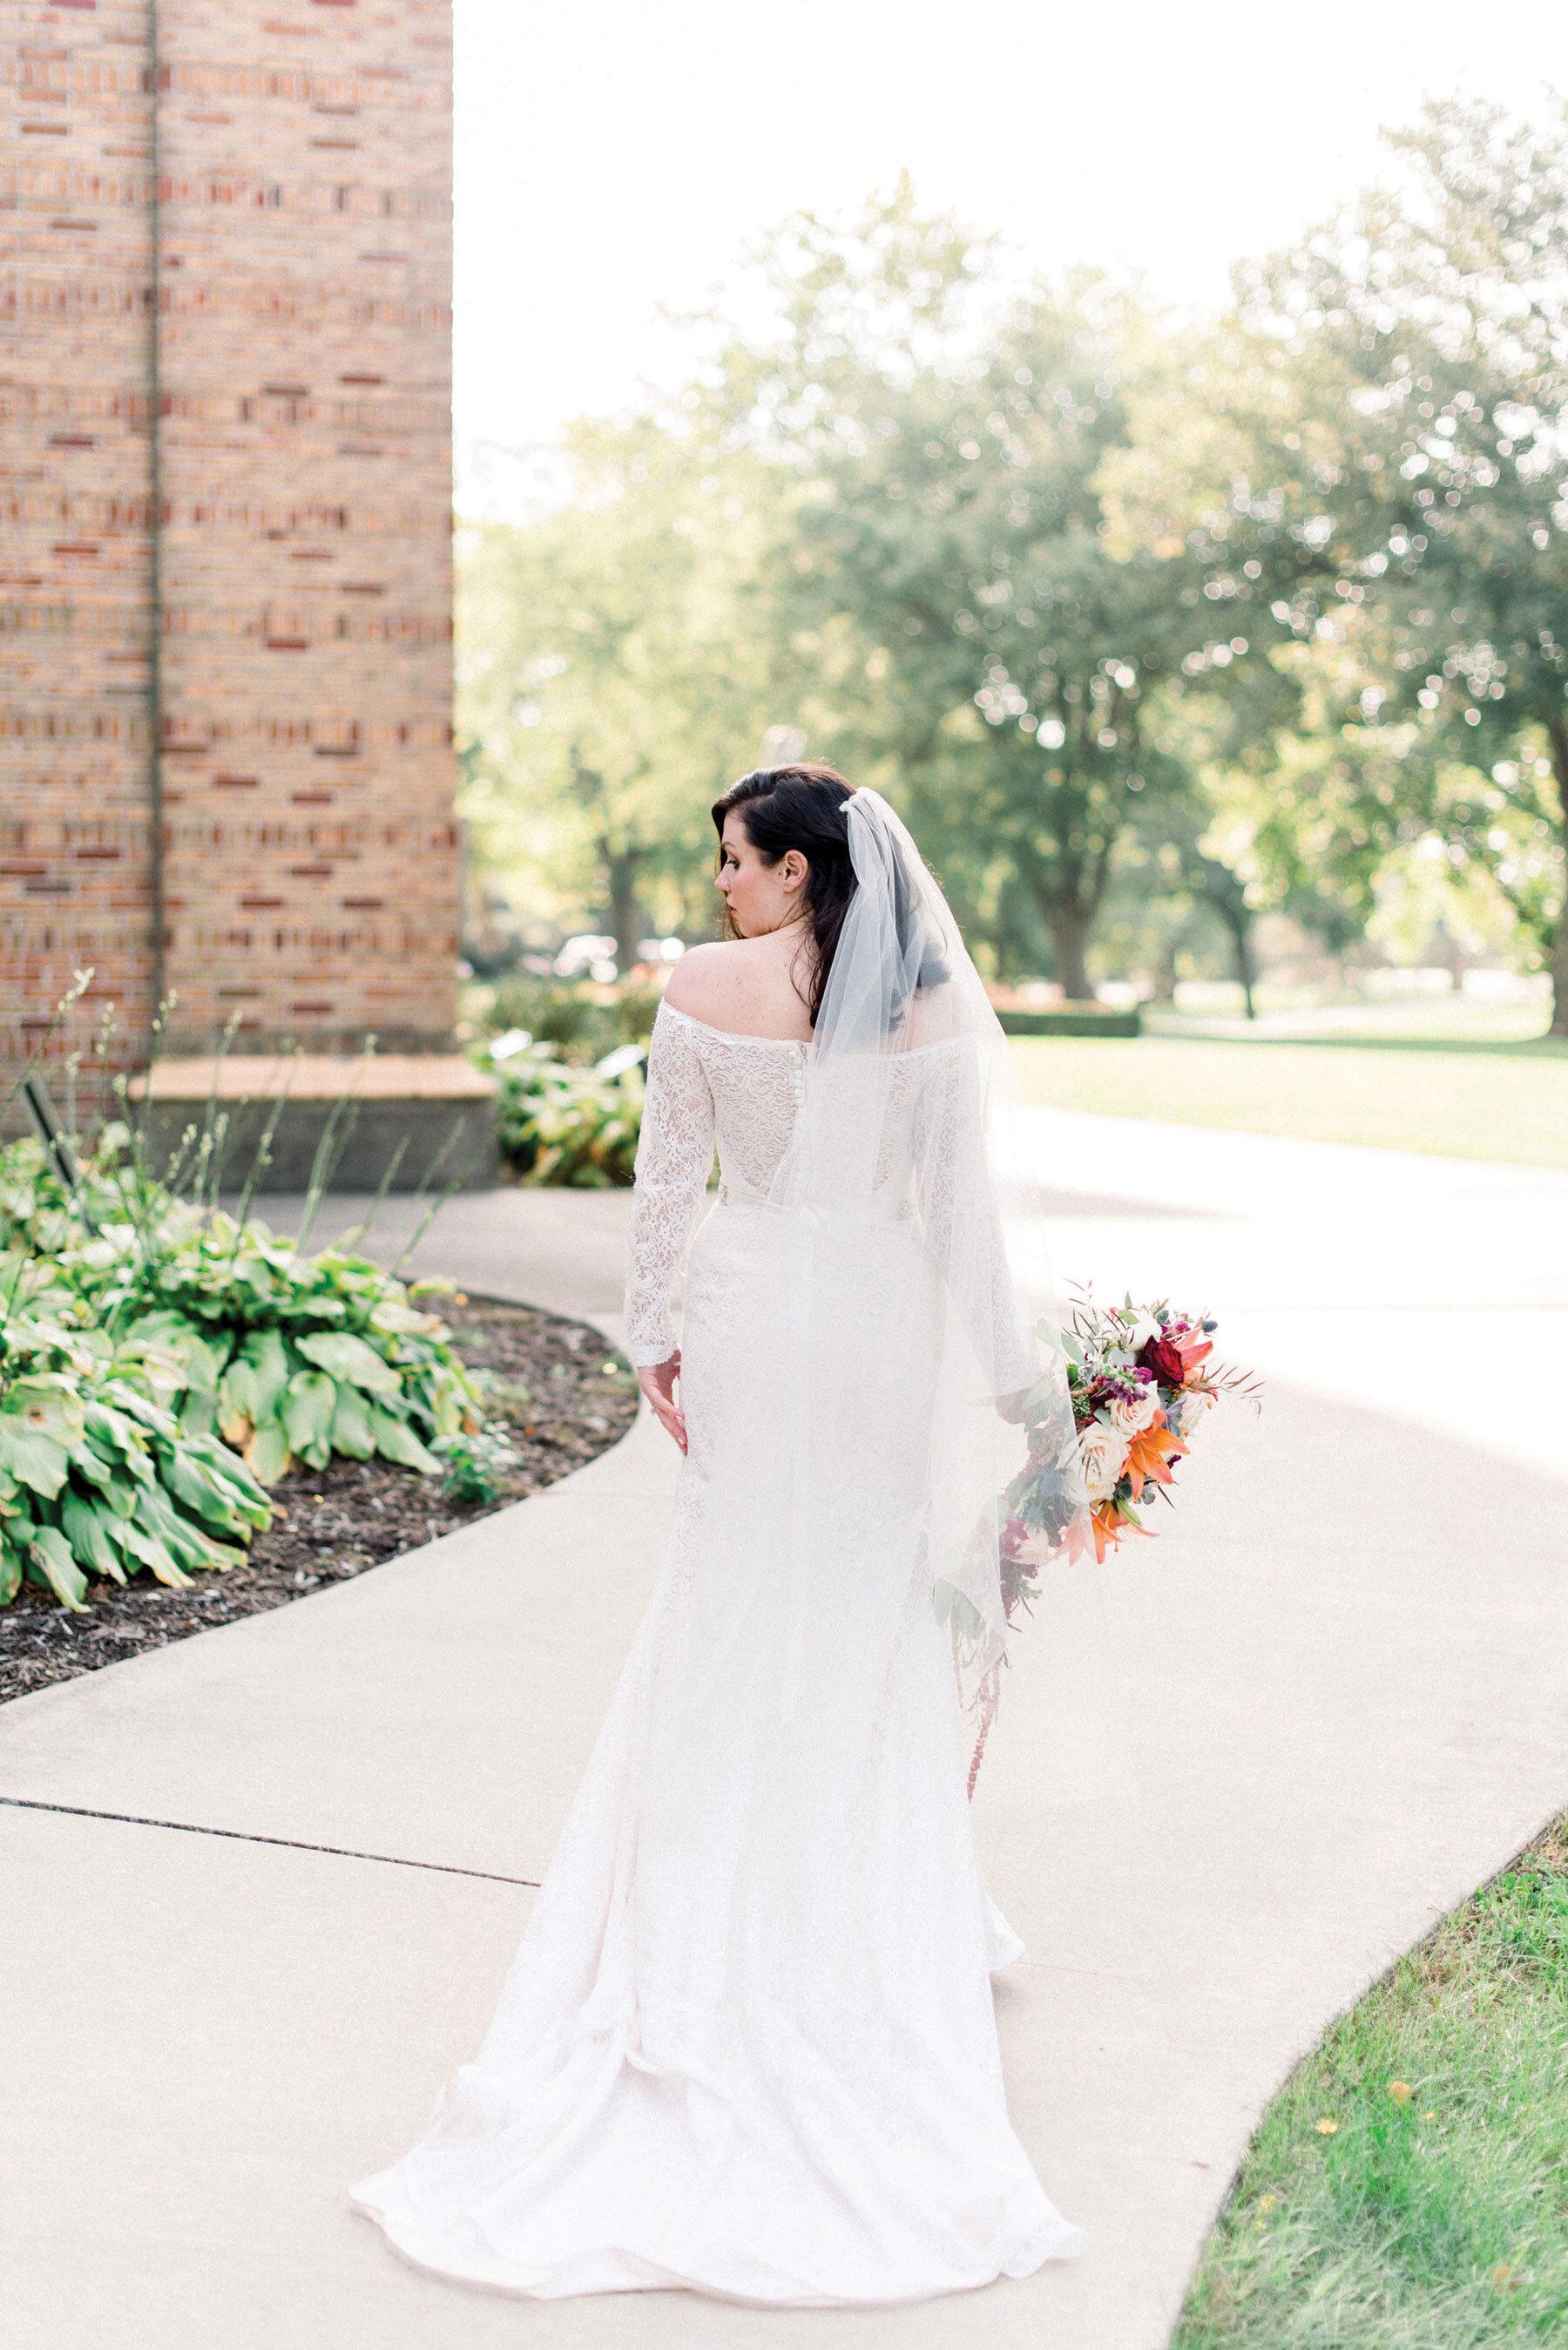 Frankhouse-Wedding-0011.jpg